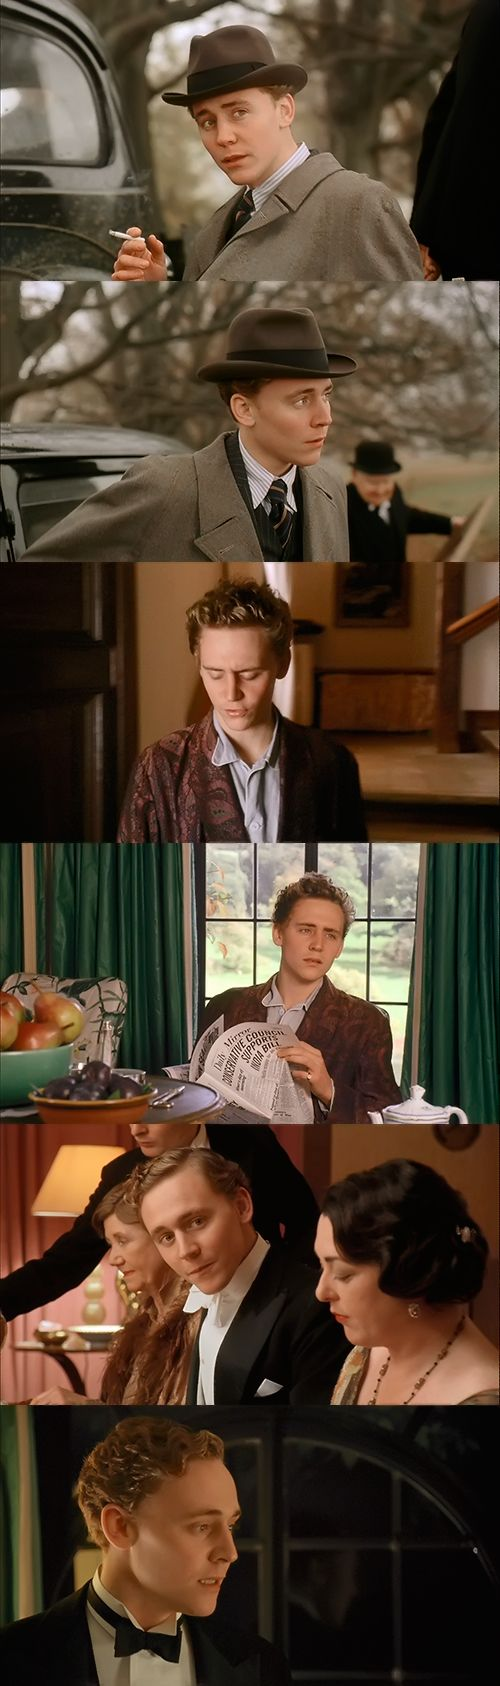 Tom Hiddleston as Randolph Churchill in The Gathering Storm (2002). Link: https://rarbg.to/torrent/pfczmdl Photoset (from Torrilla): http://maryxglz.tumblr.com/post/155871064992/tom-hiddleston-as-randolph-churchill-in-the